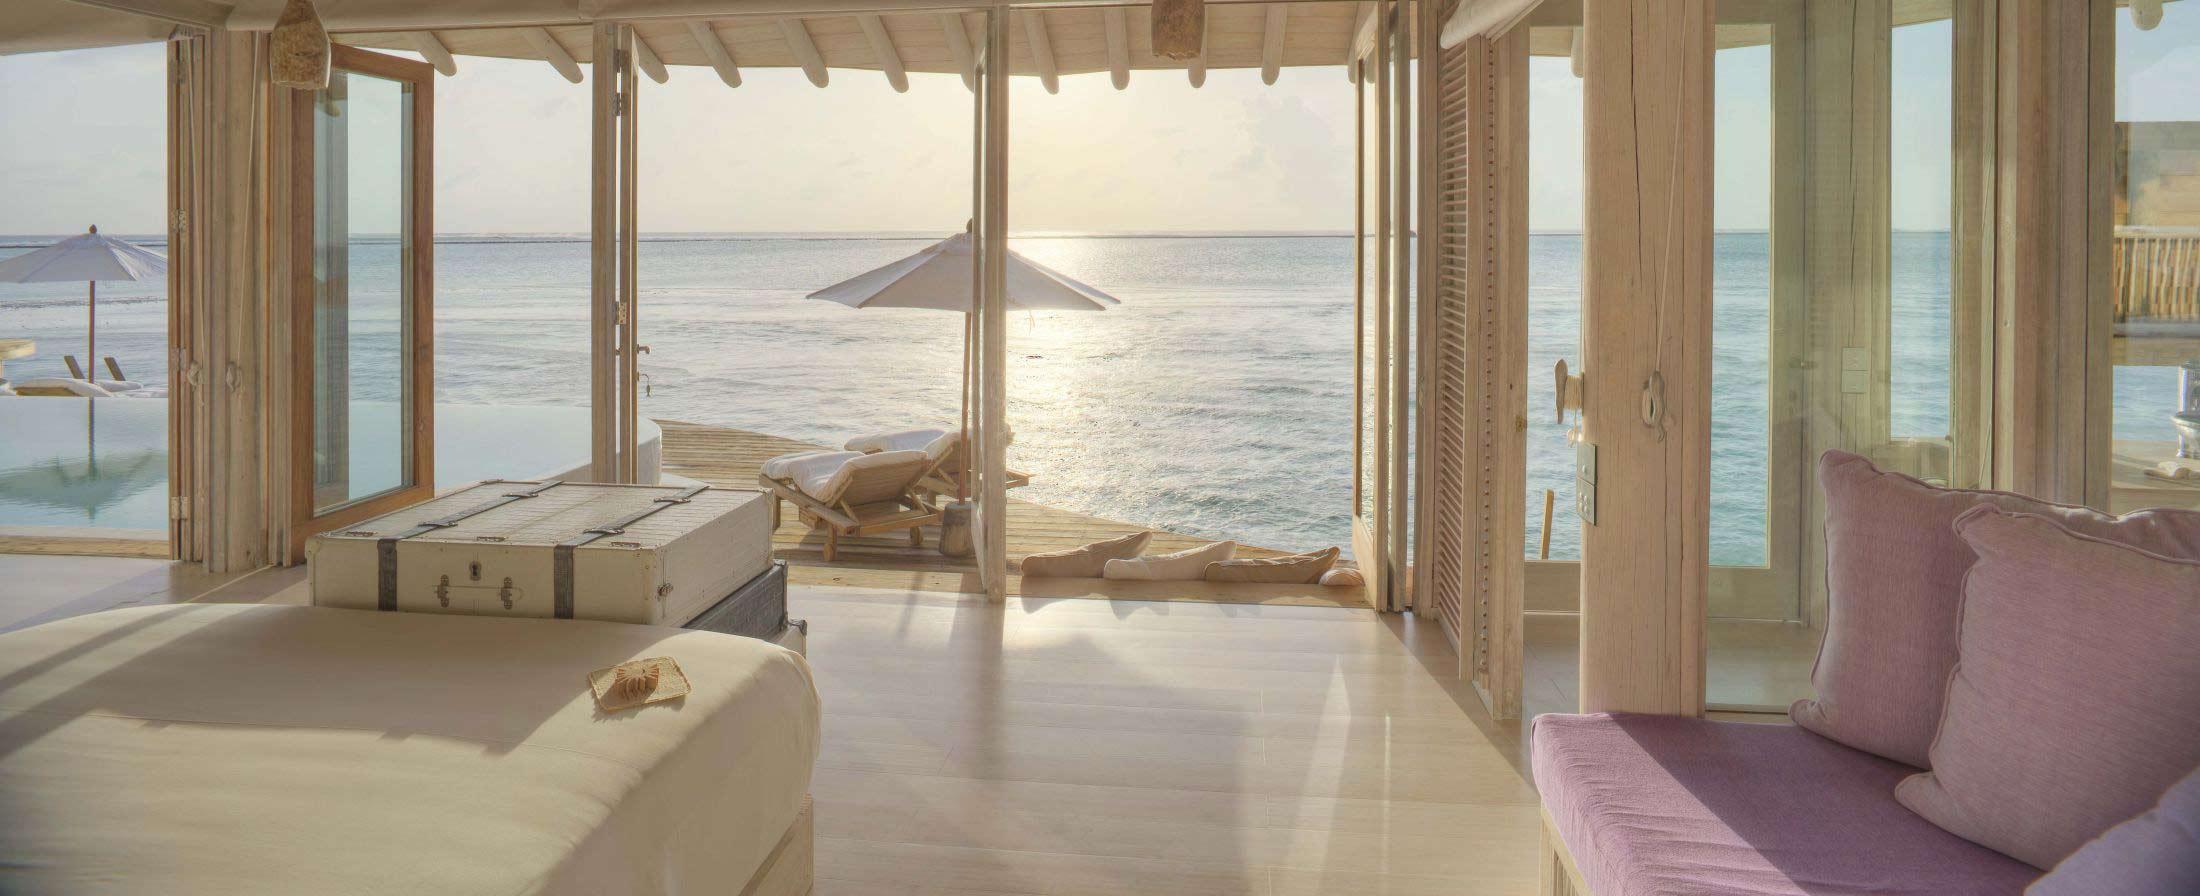 soneva jani villa, blue lagoon, cinema paradiso cinema, medhufaru island, mike dalley, so starstuck, soneva jani, the gathering, will smith